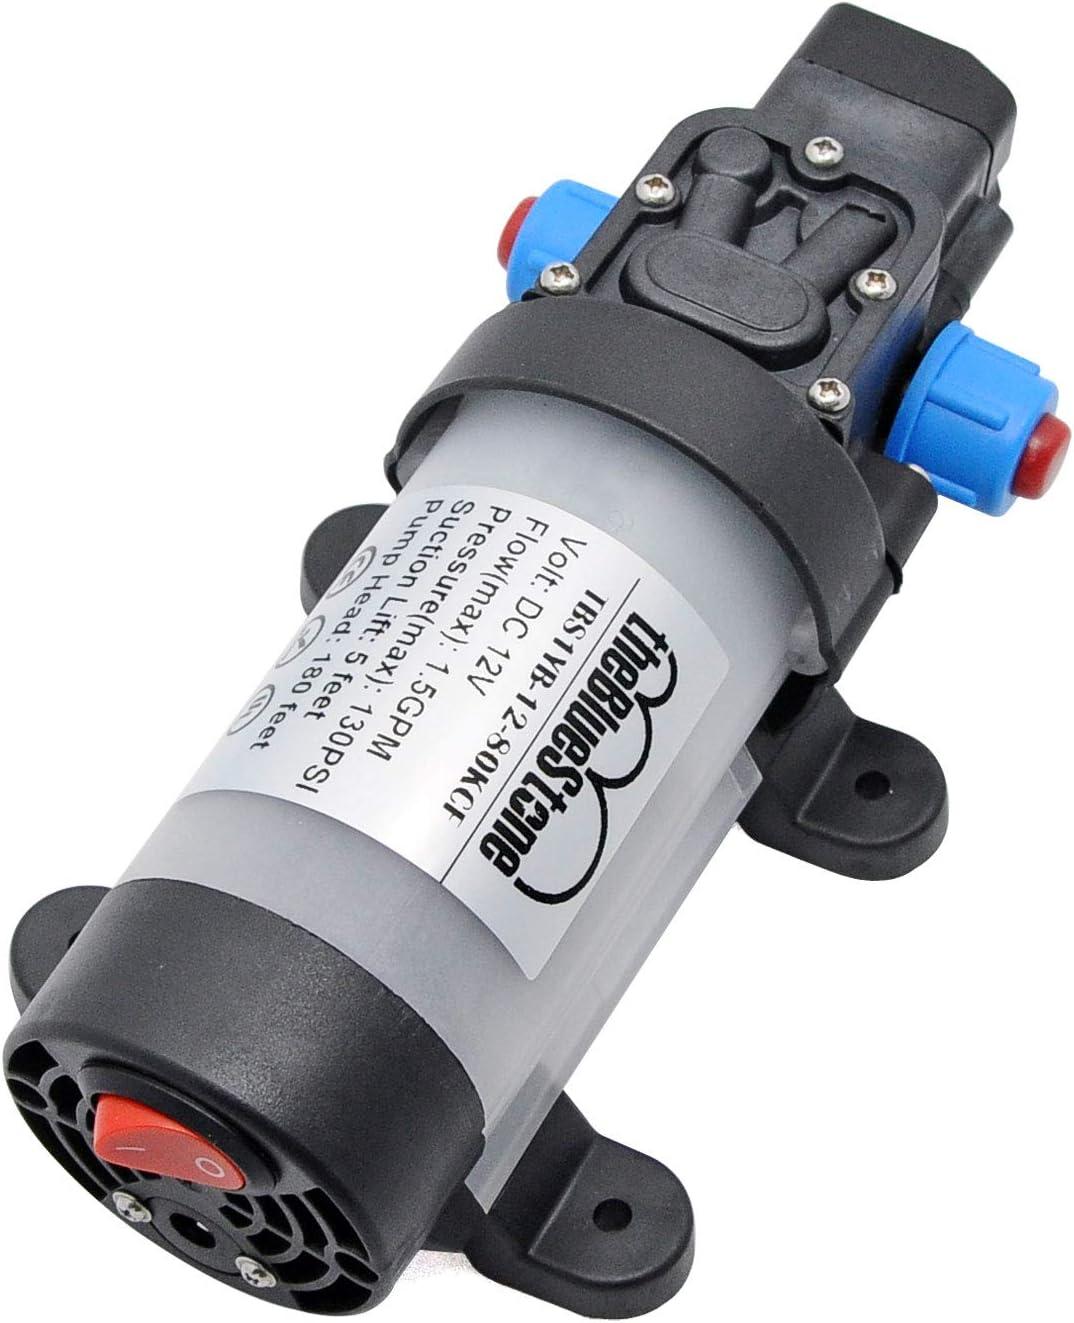 medicina e industria bomba de agua de diafragma resistente al desgaste Bomba de diafragma DC12V para instrumentos y equipos bajo nivel de ruido micro bomba de diafragma autocebante 0.4-1L // min